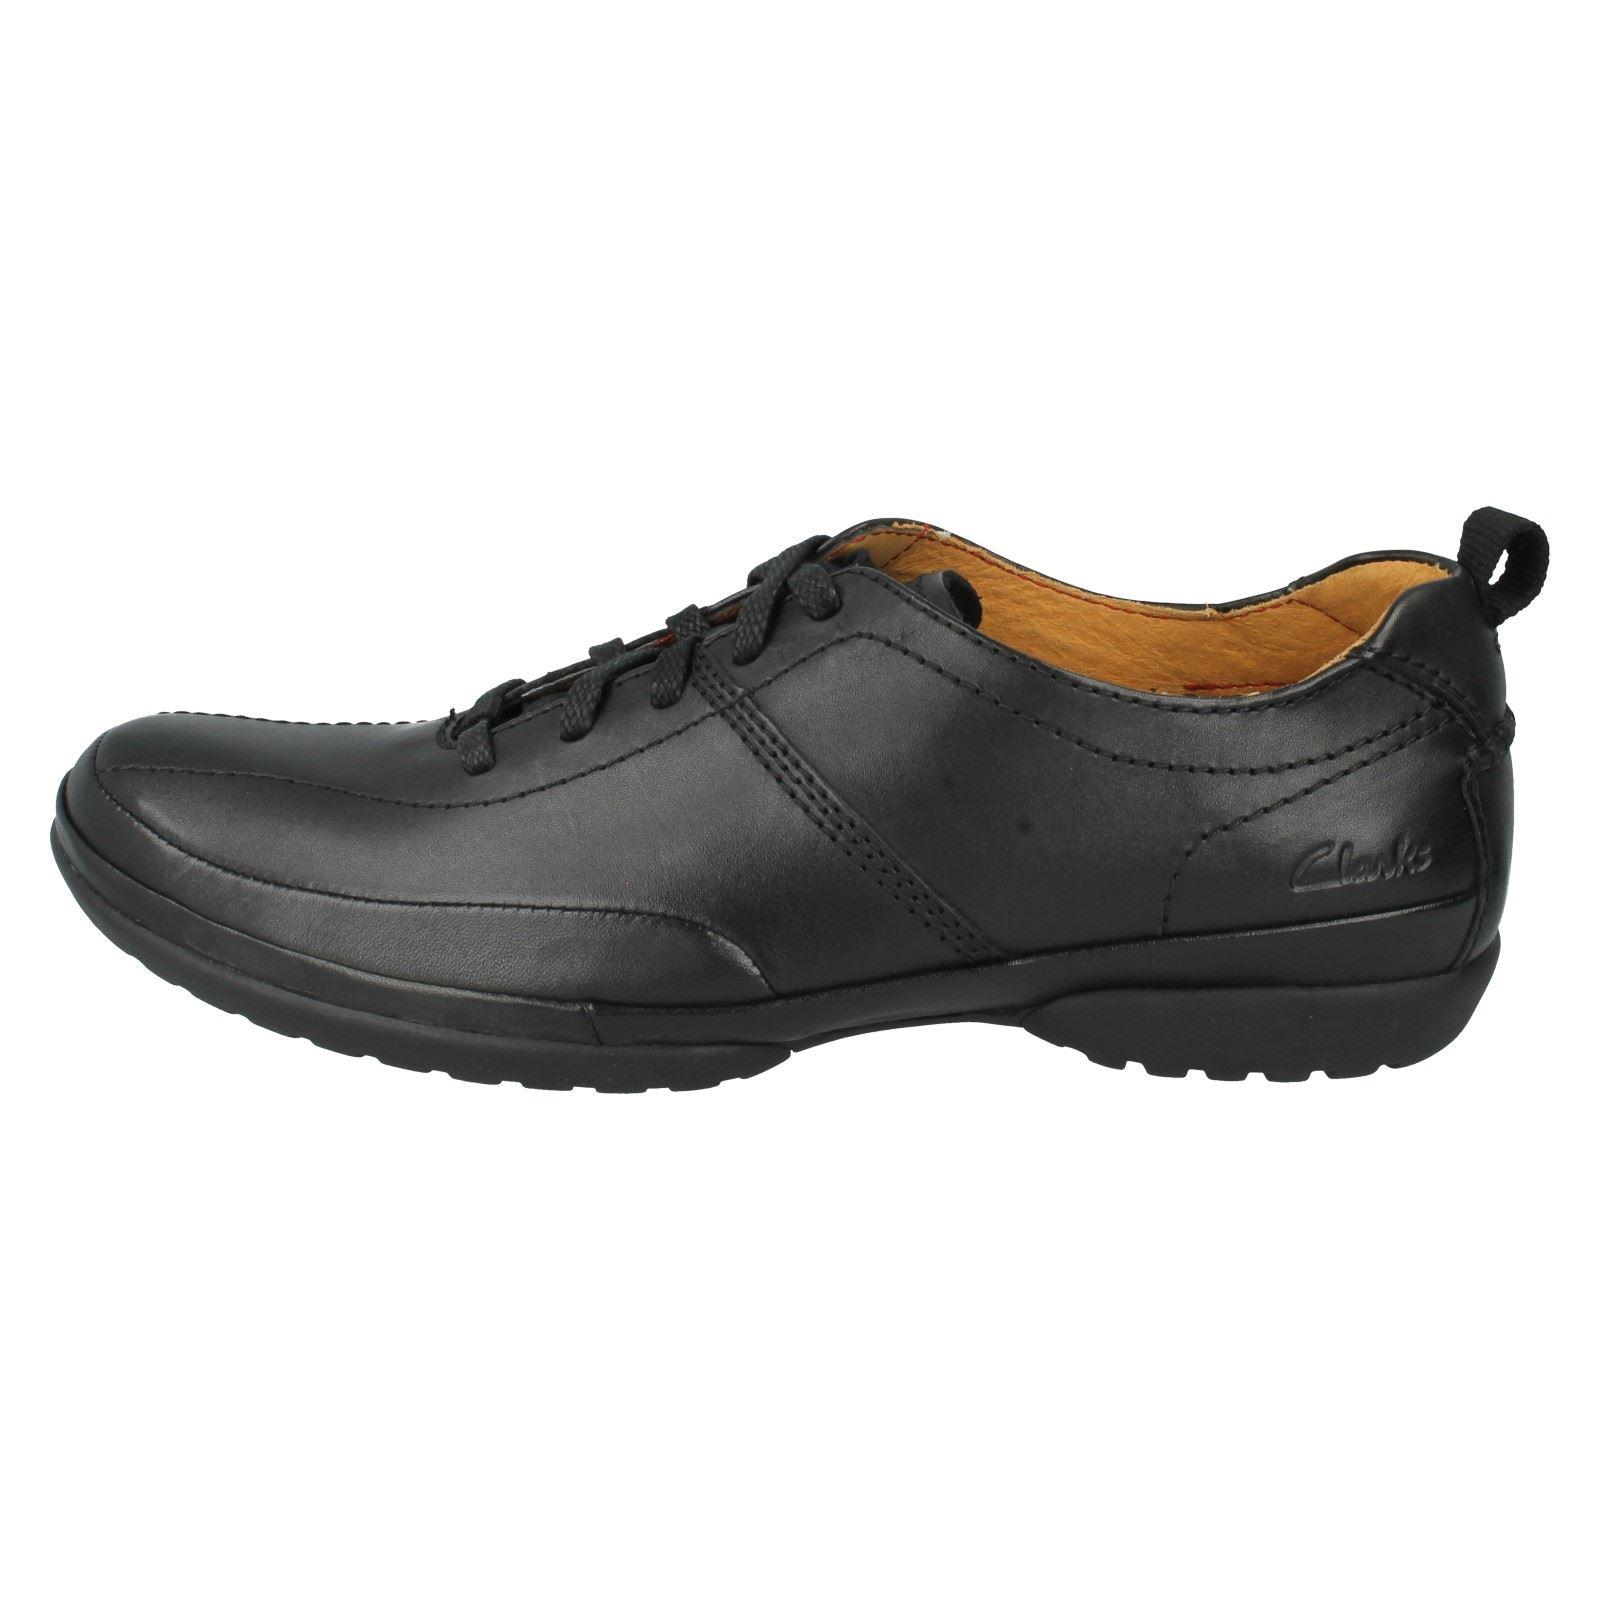 Men's Clarks Casual Schuhes Recline Style -  Recline Schuhes Inn 2e401c